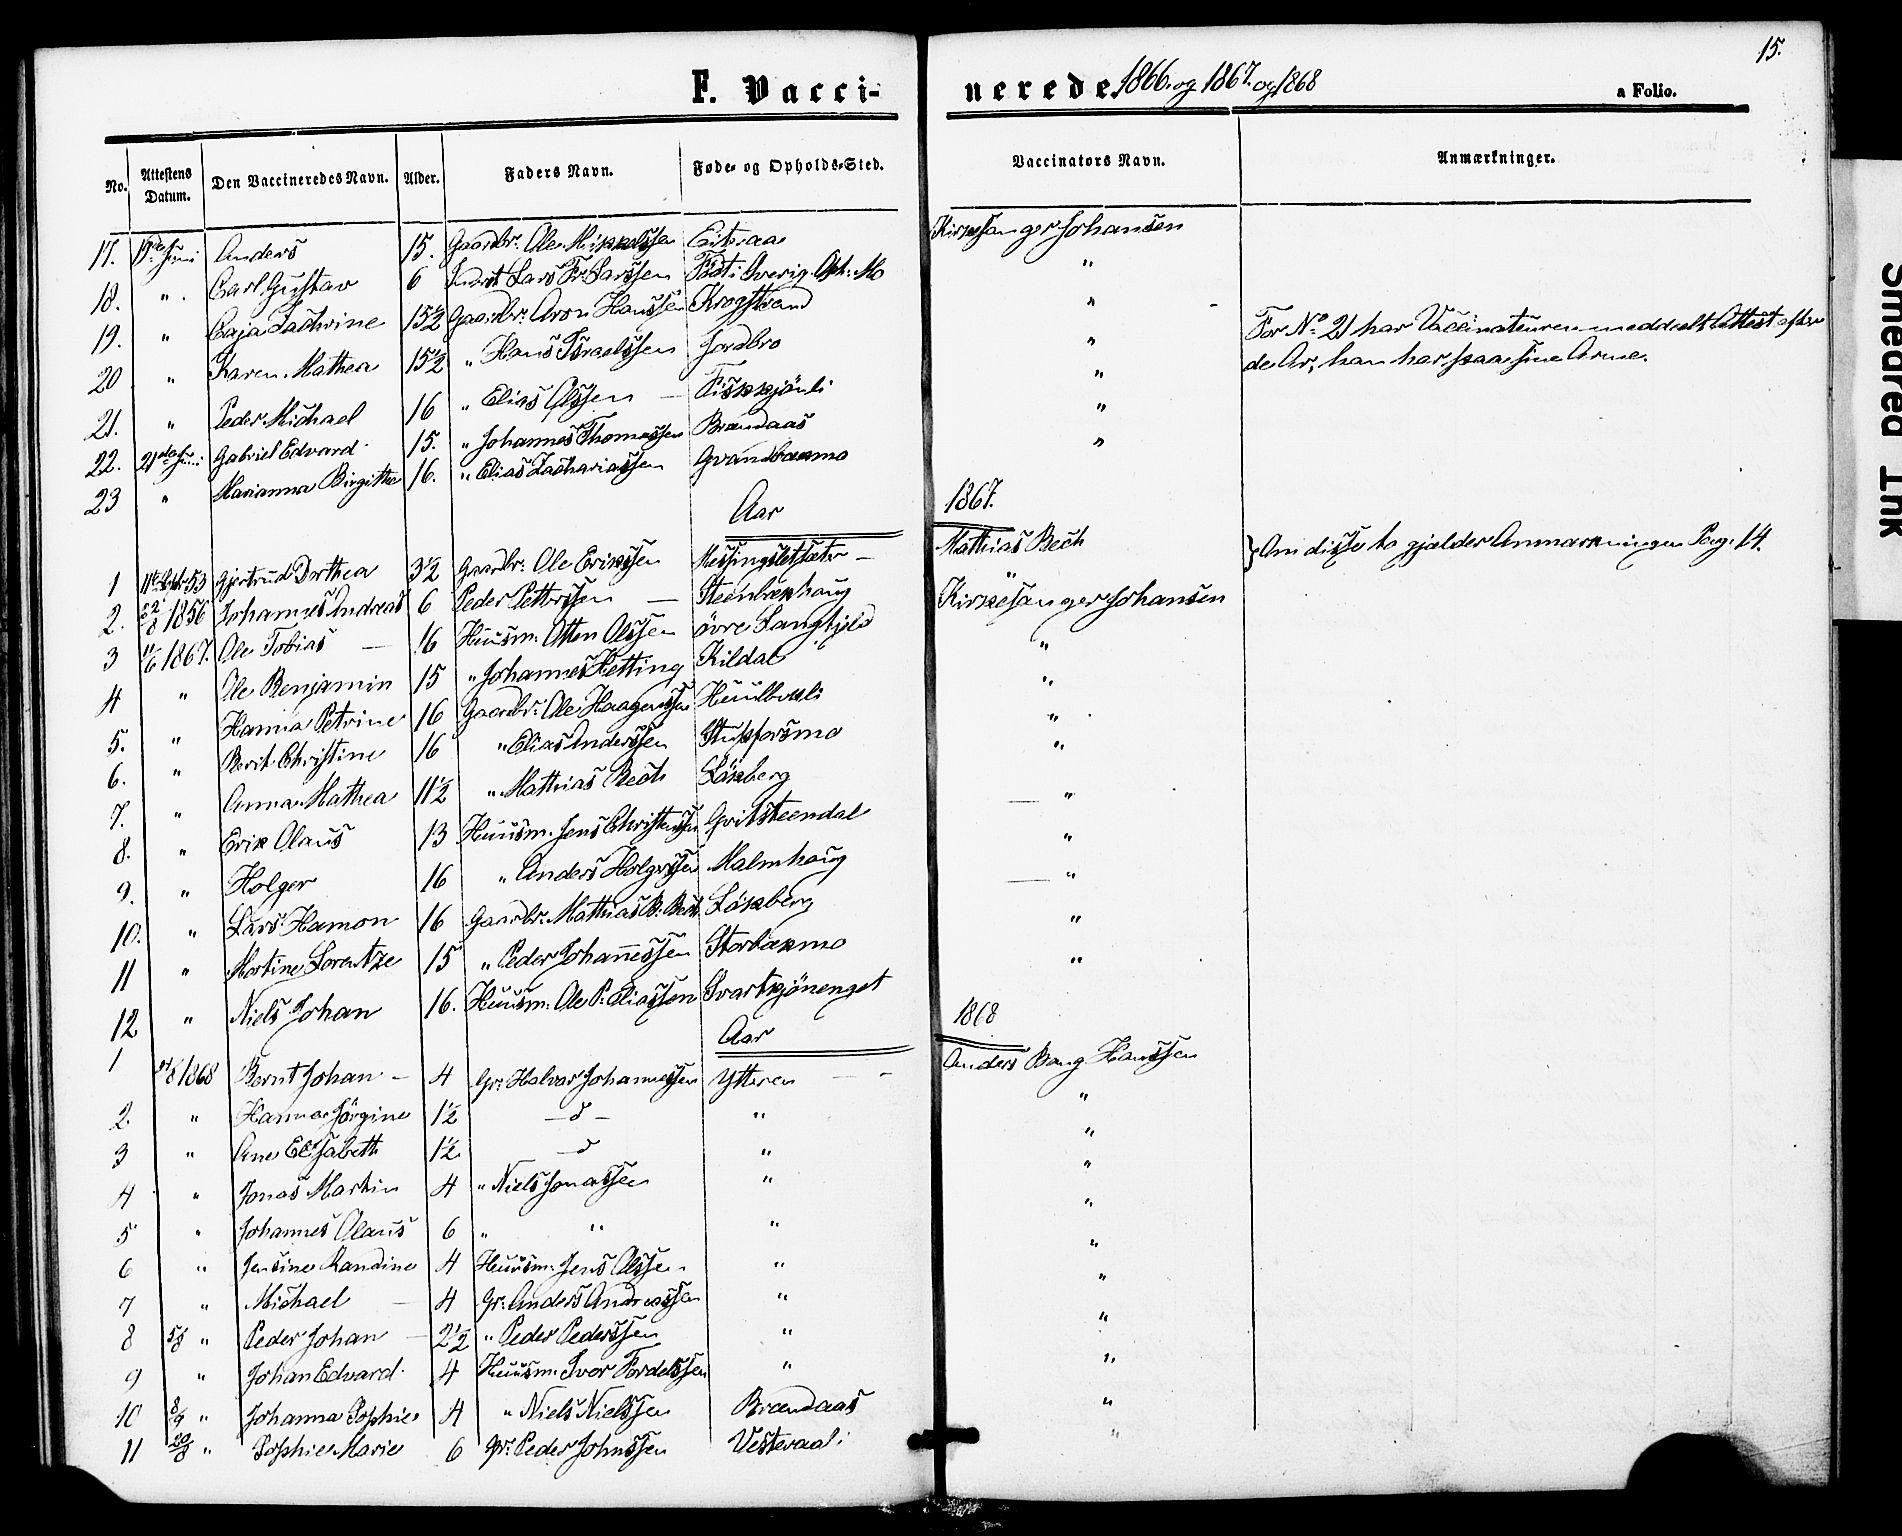 SAT, Ministerialprotokoller, klokkerbøker og fødselsregistre - Nordland, 827/L0397: Ministerialbok nr. 827A09, 1862-1876, s. 15